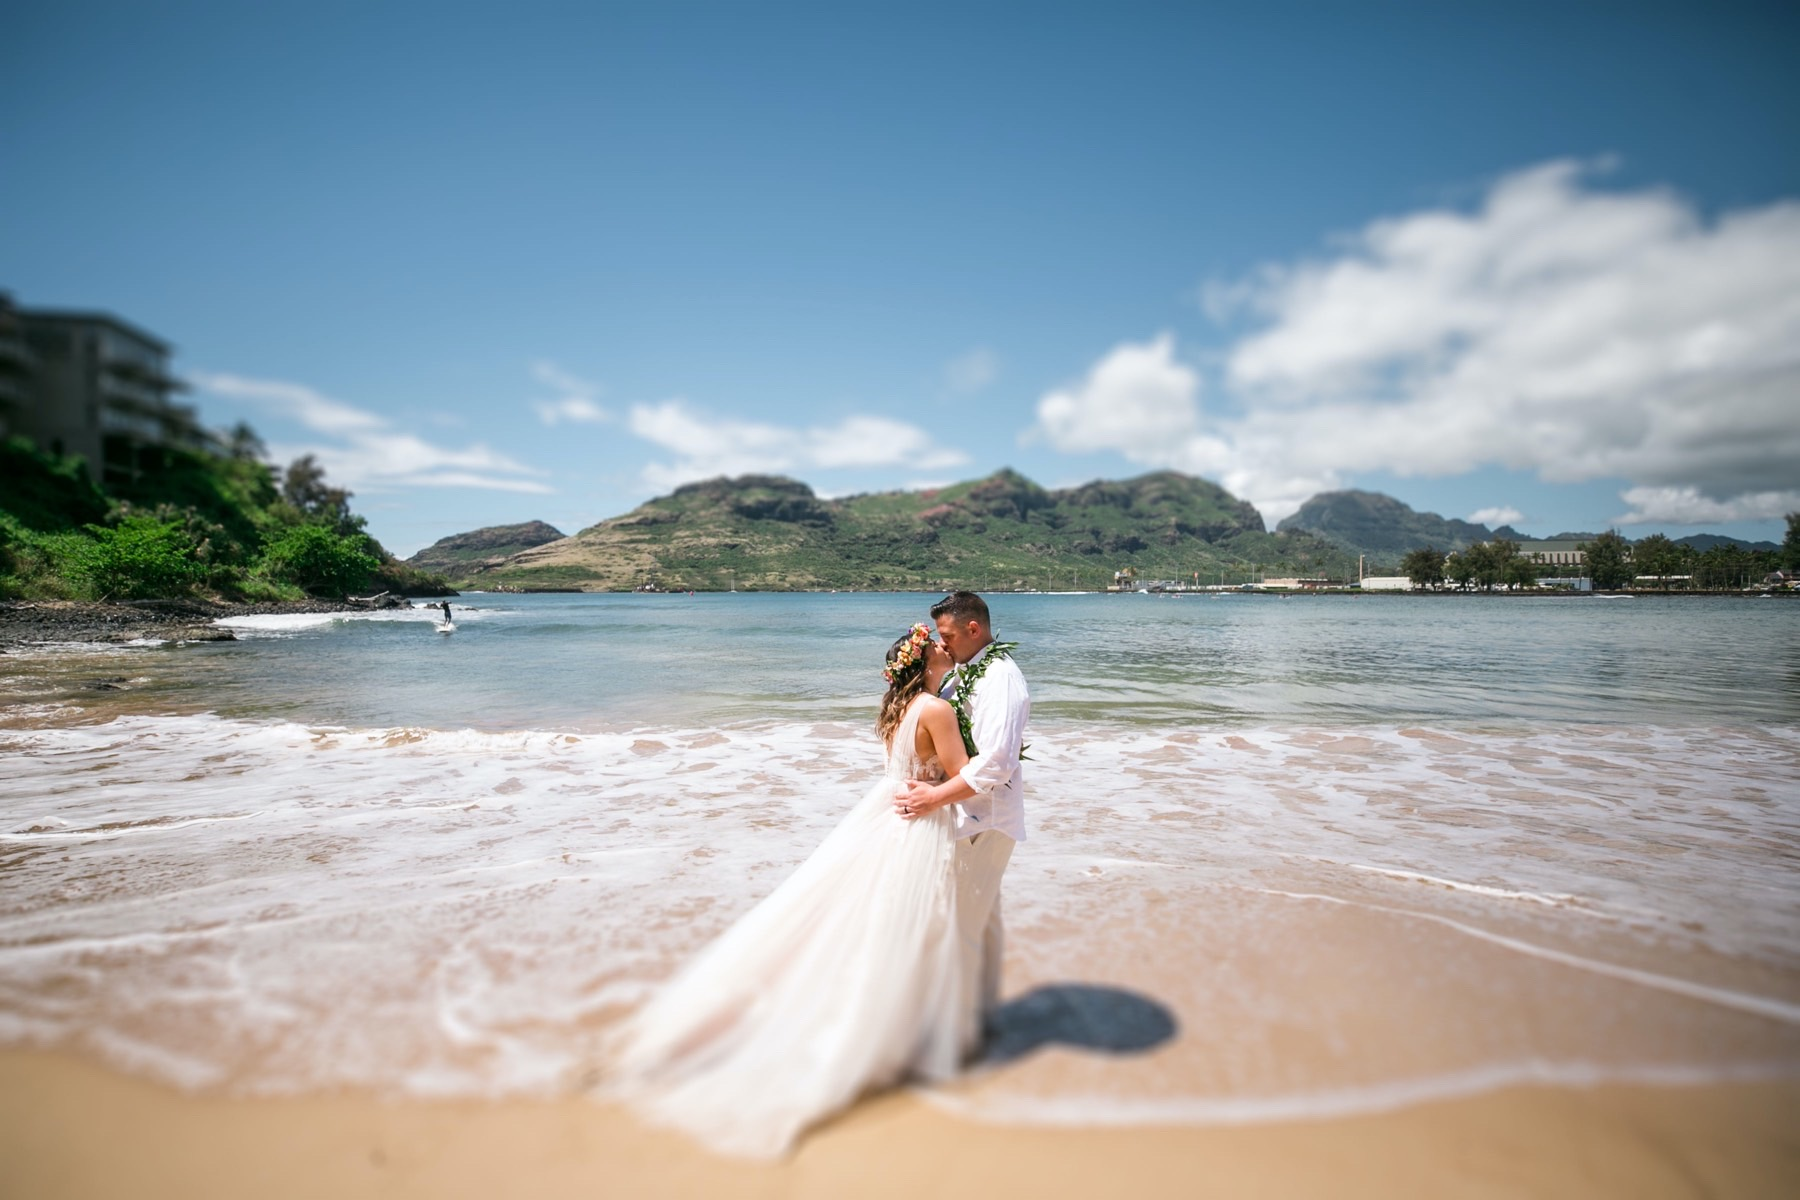 Kristen and Ryan on the beach in Kauai.